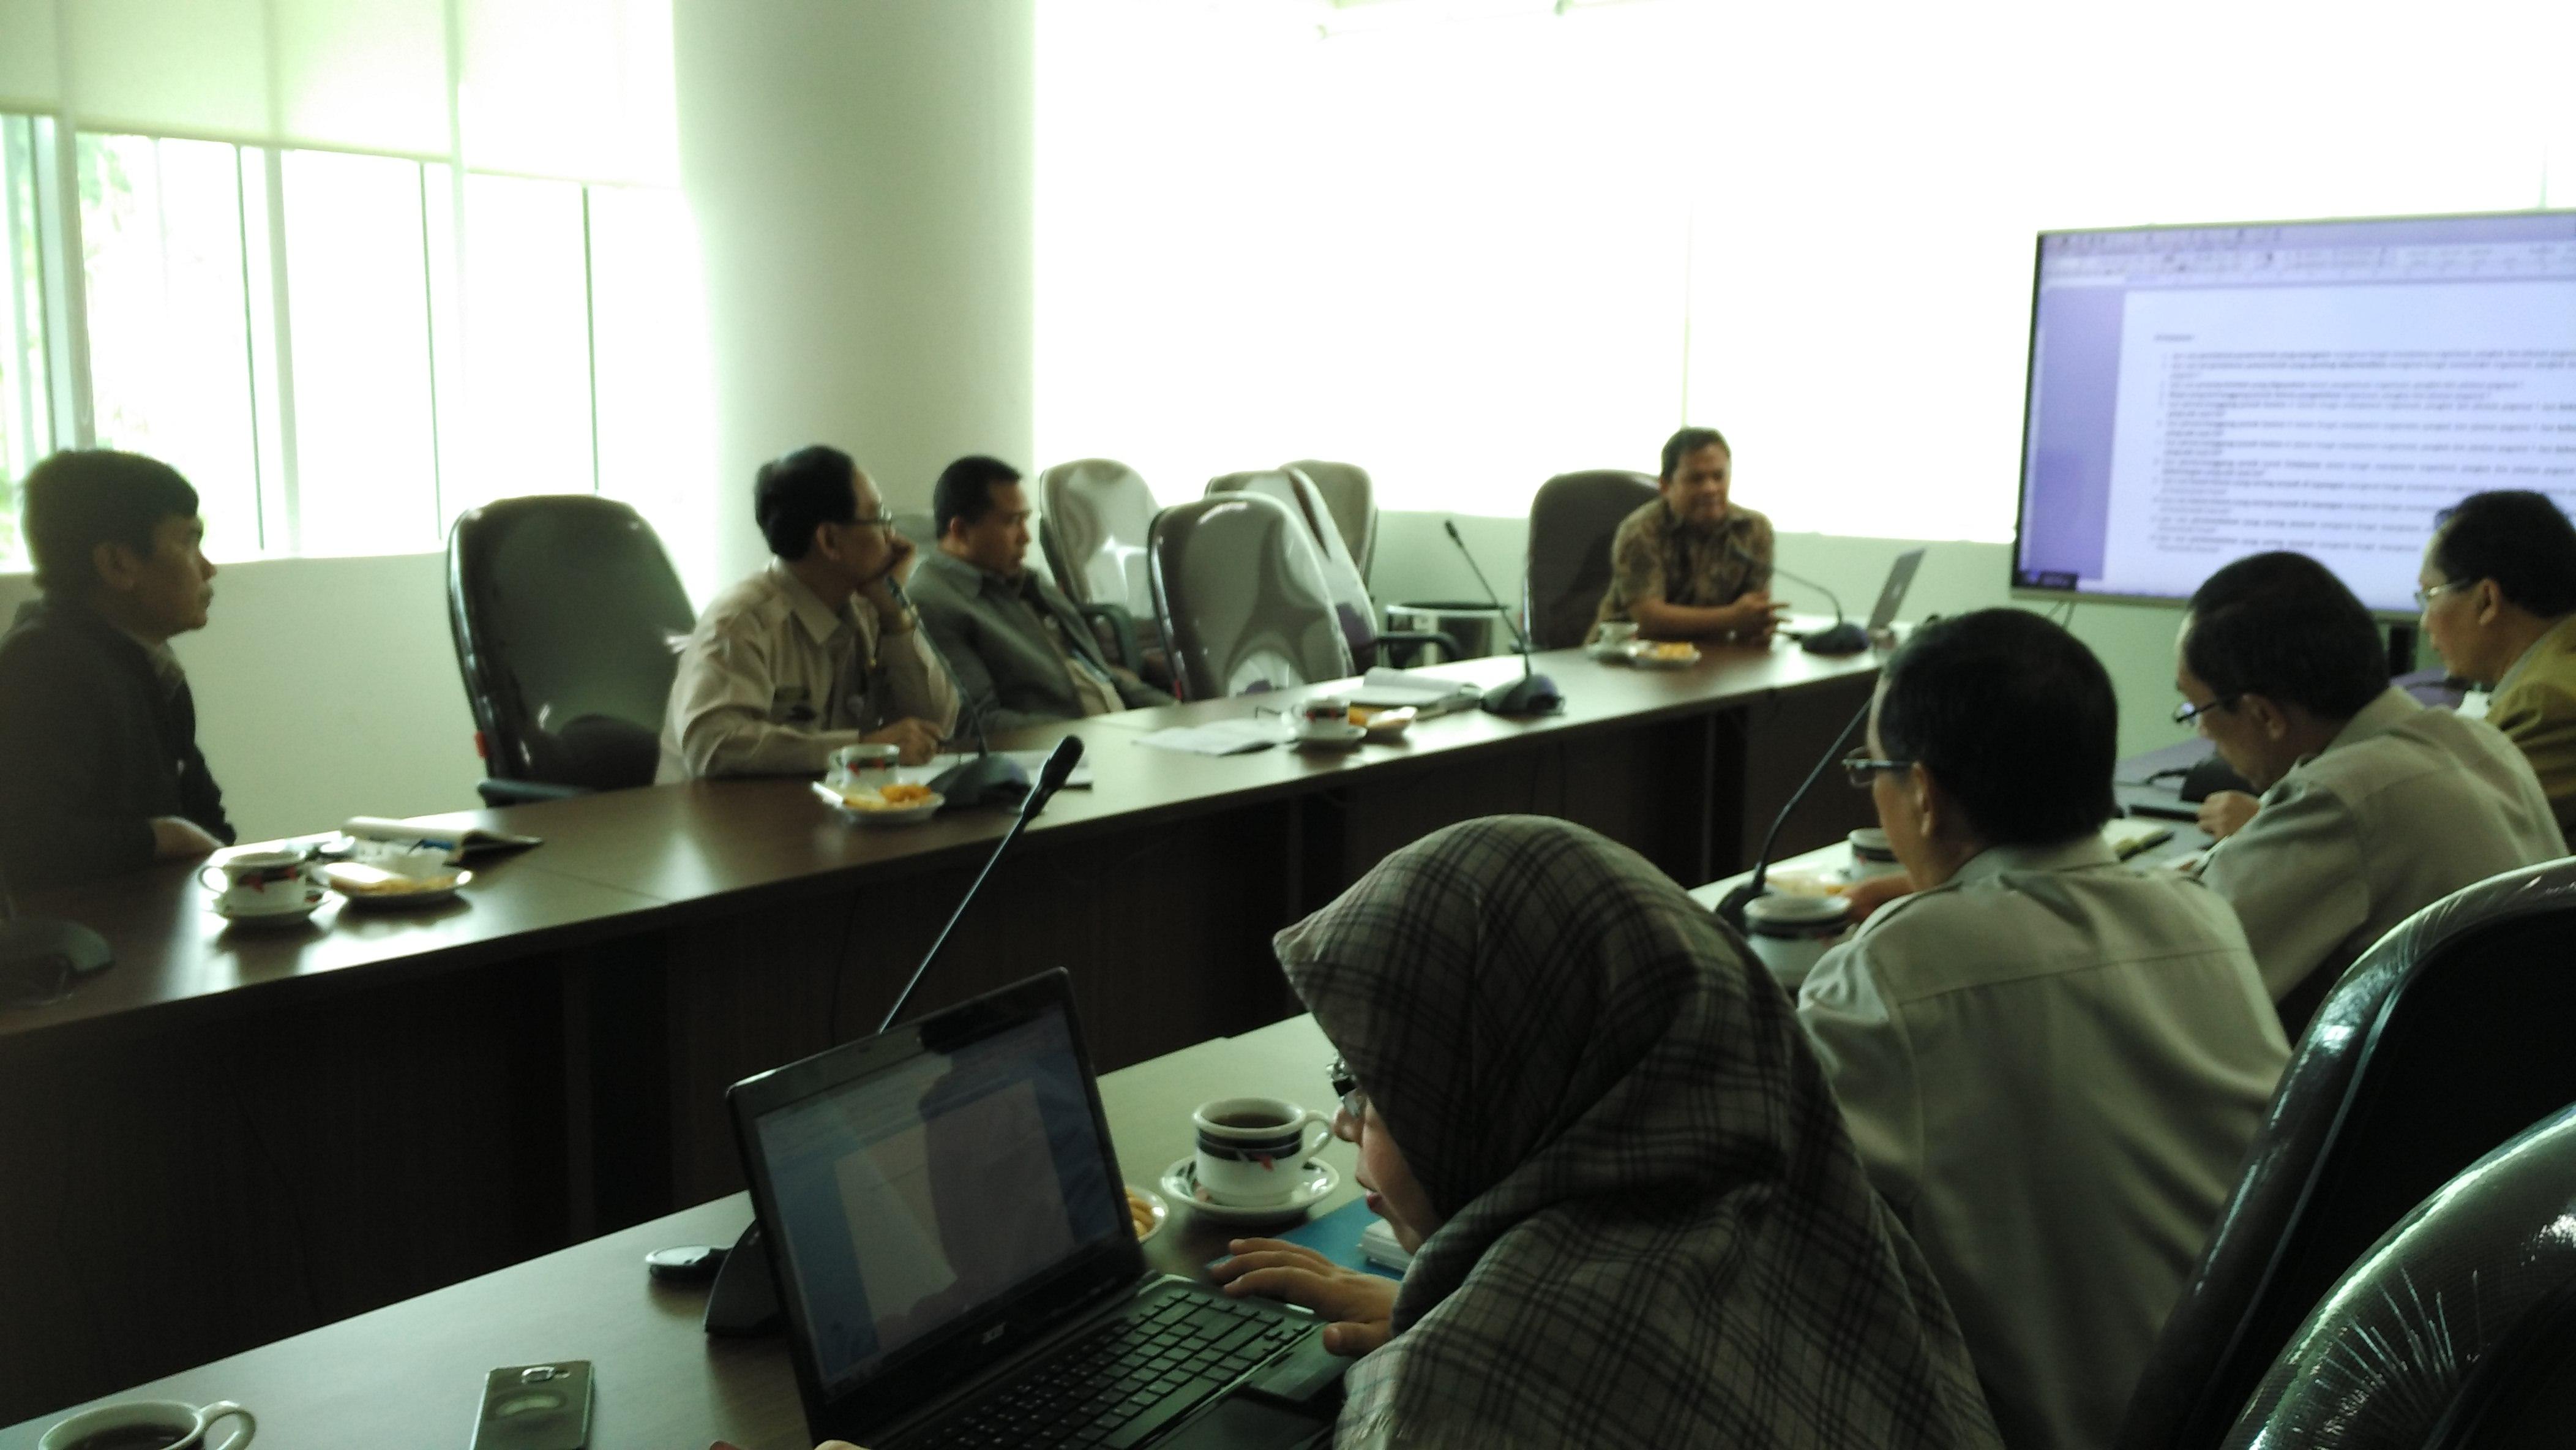 Pusbang-BKN-Perancangan Diklat Manajemen Organisasi